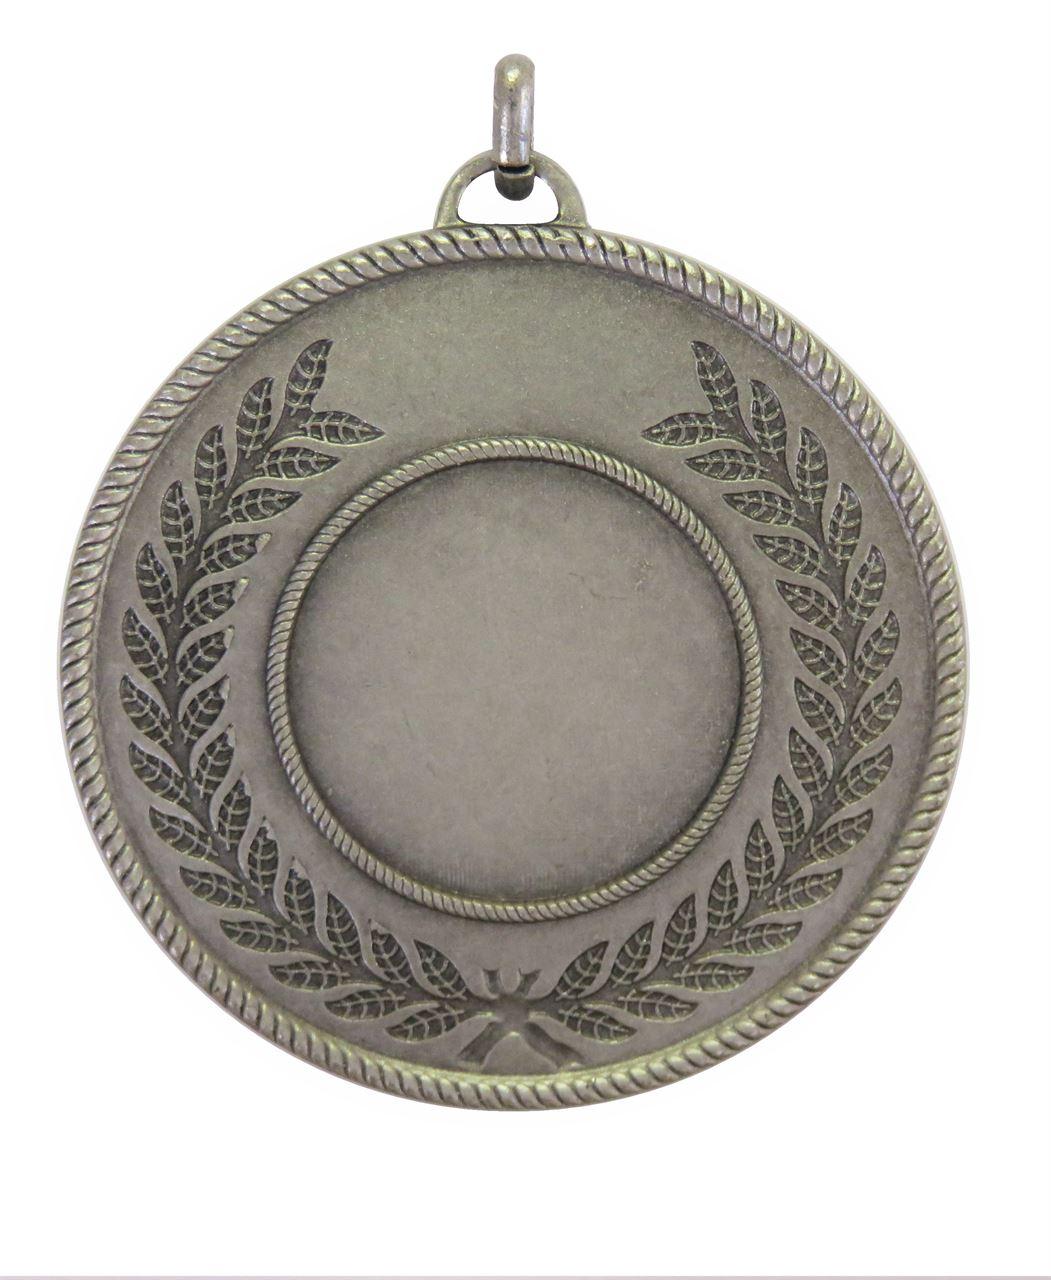 Silver Quality Laurel Surround Medal (size: 50mm) - 5820E